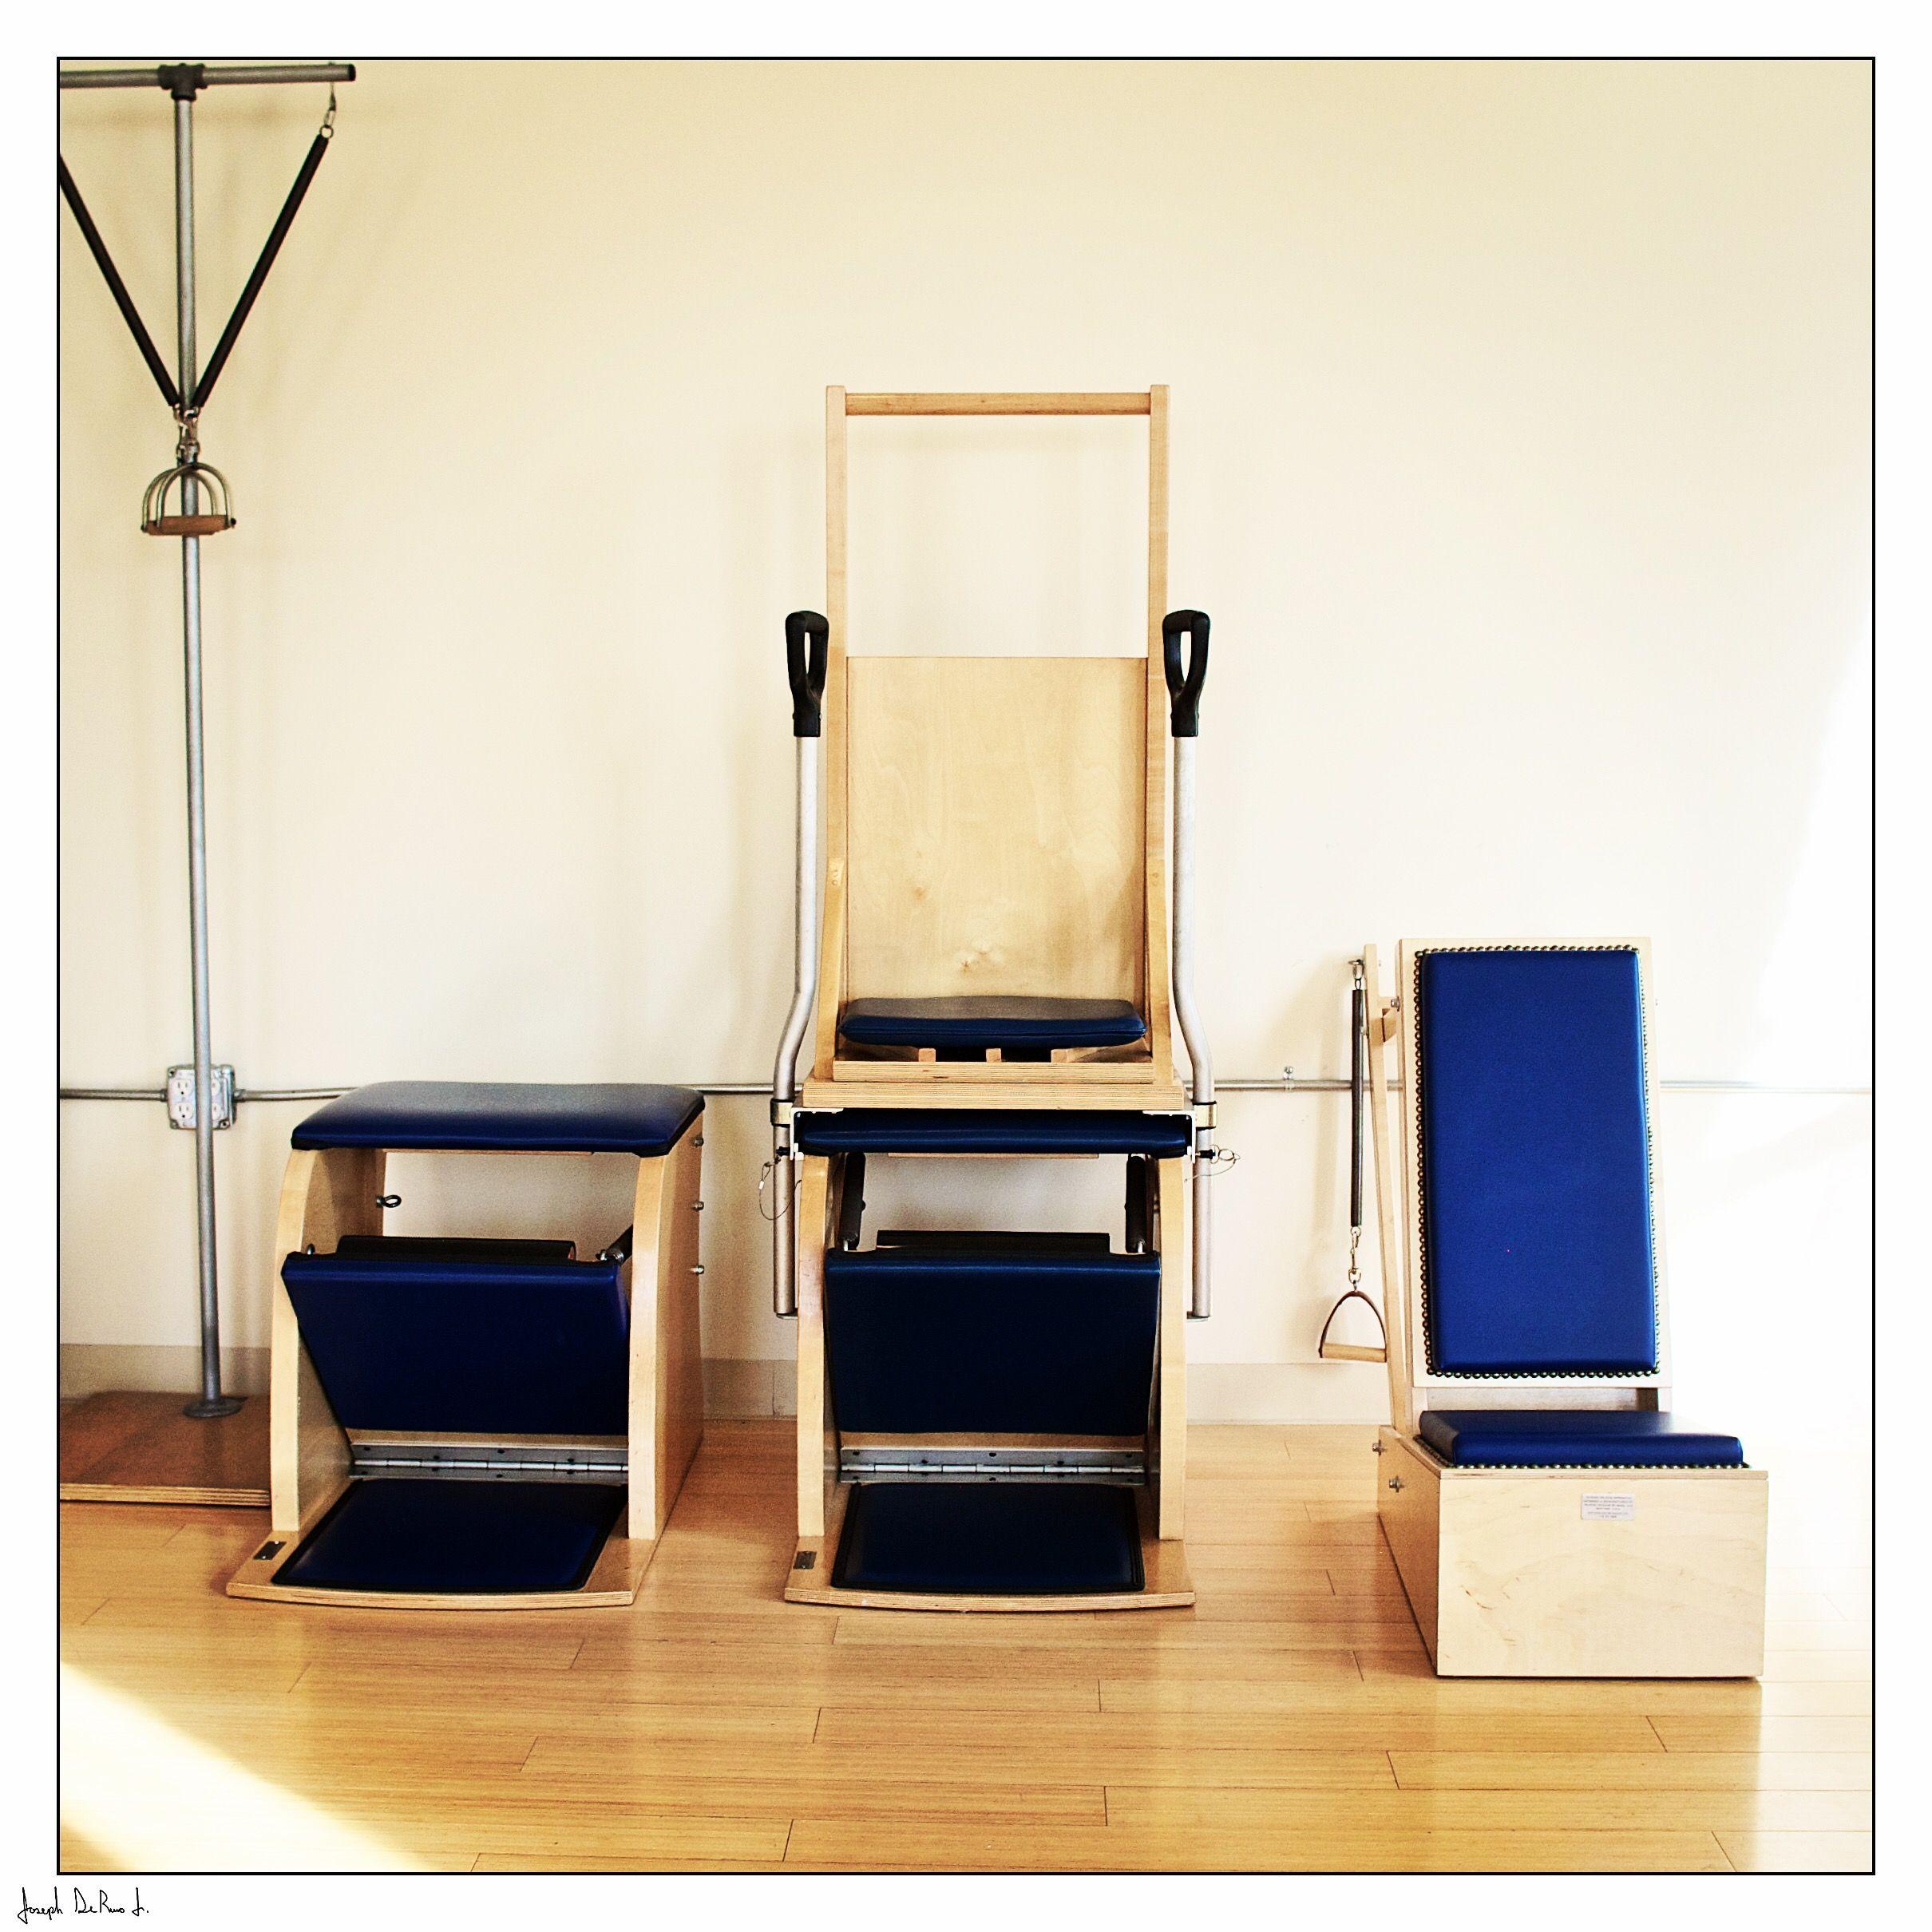 Buy Pilates Combo Chair Online: The Gratz Equipment: Ped-o-Pul, High Chair, Wunda Chair